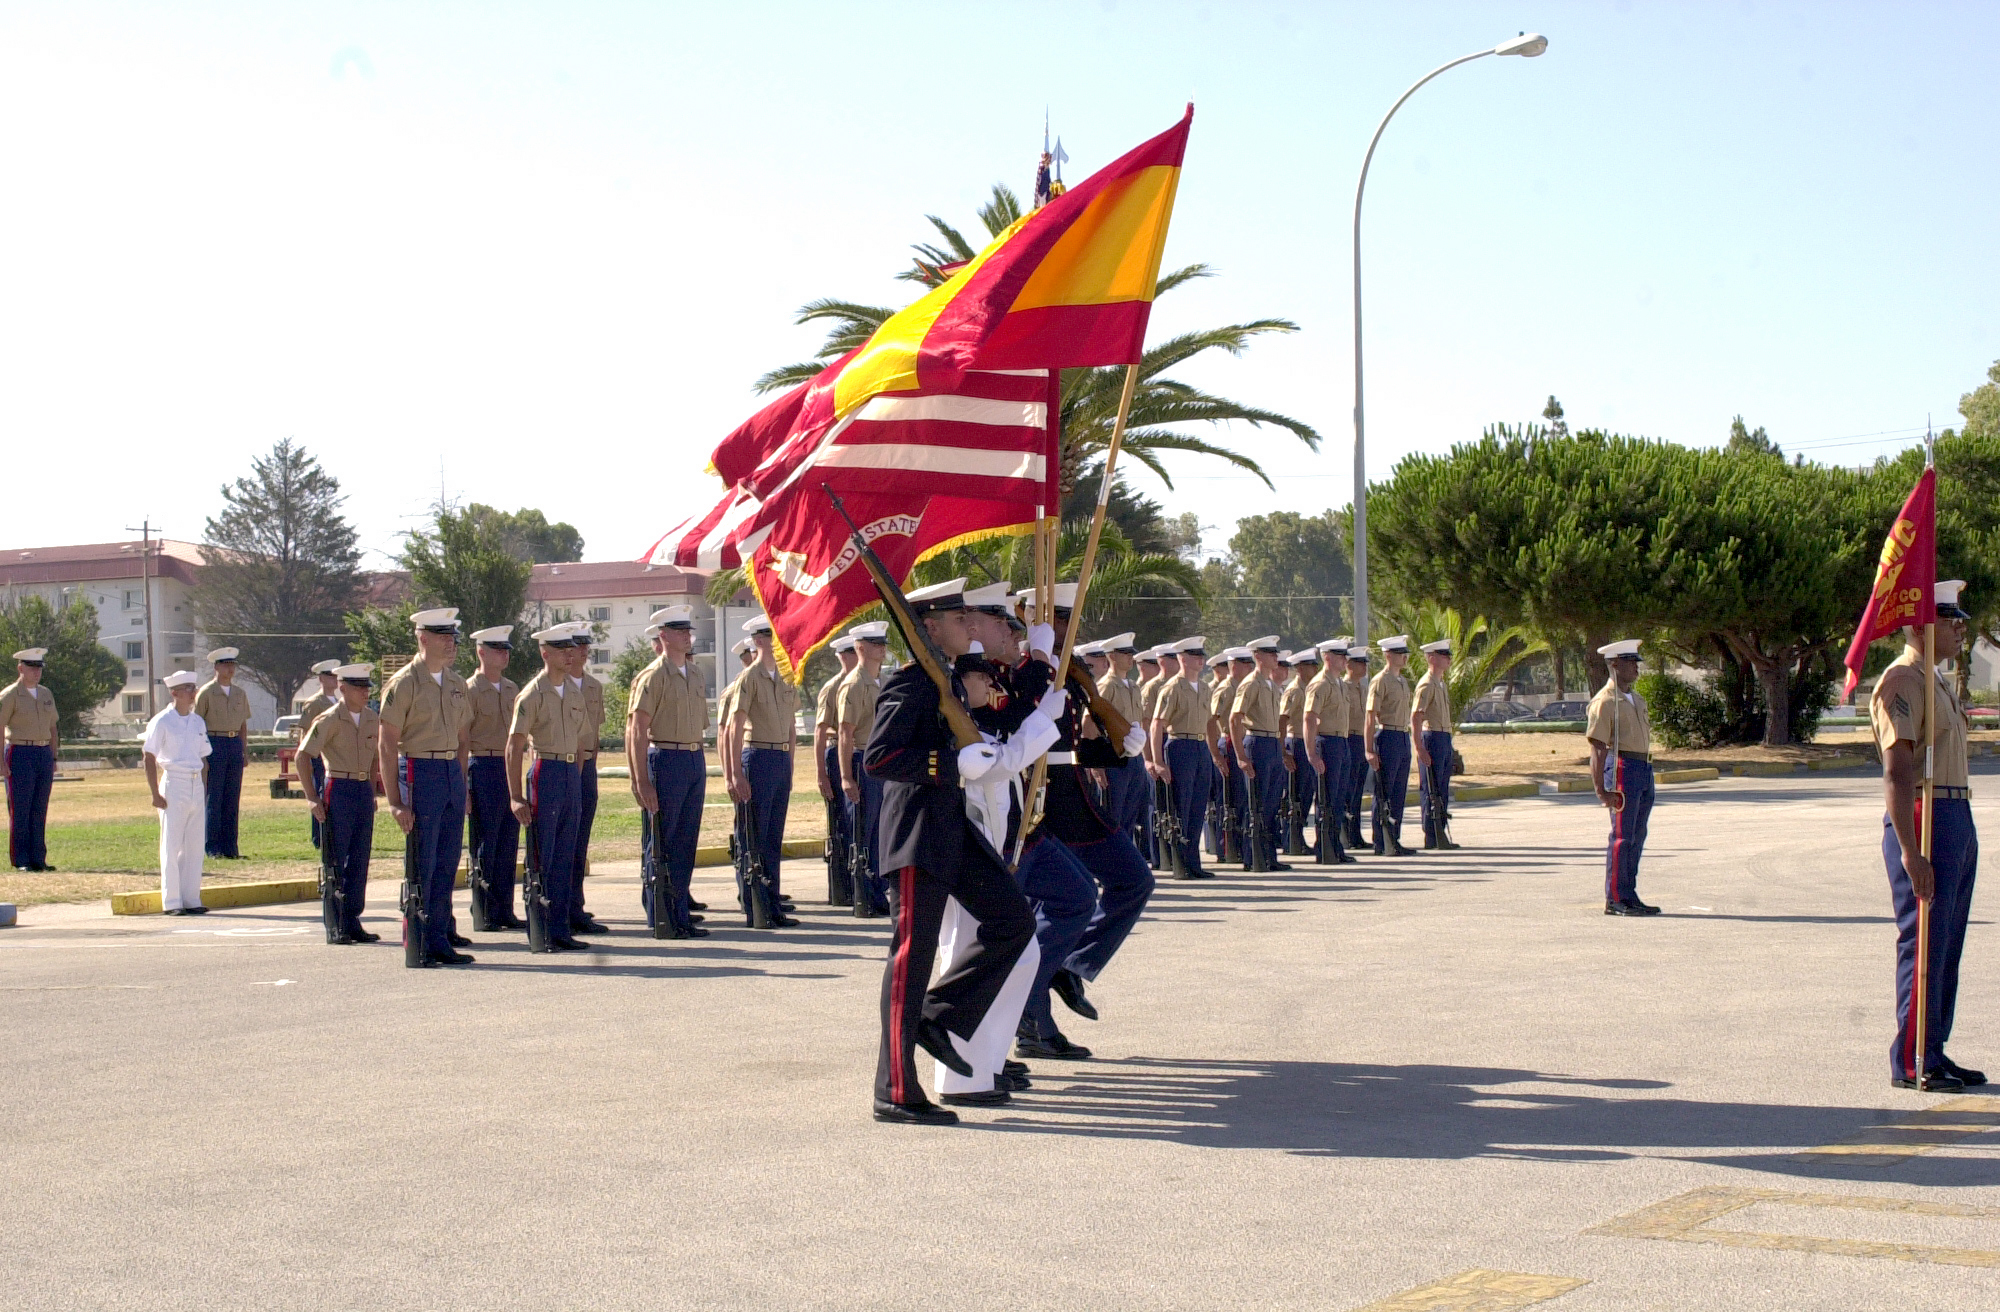 File:US Navy 020712-N-1147E-001 Color guard - Rota.jpg ...